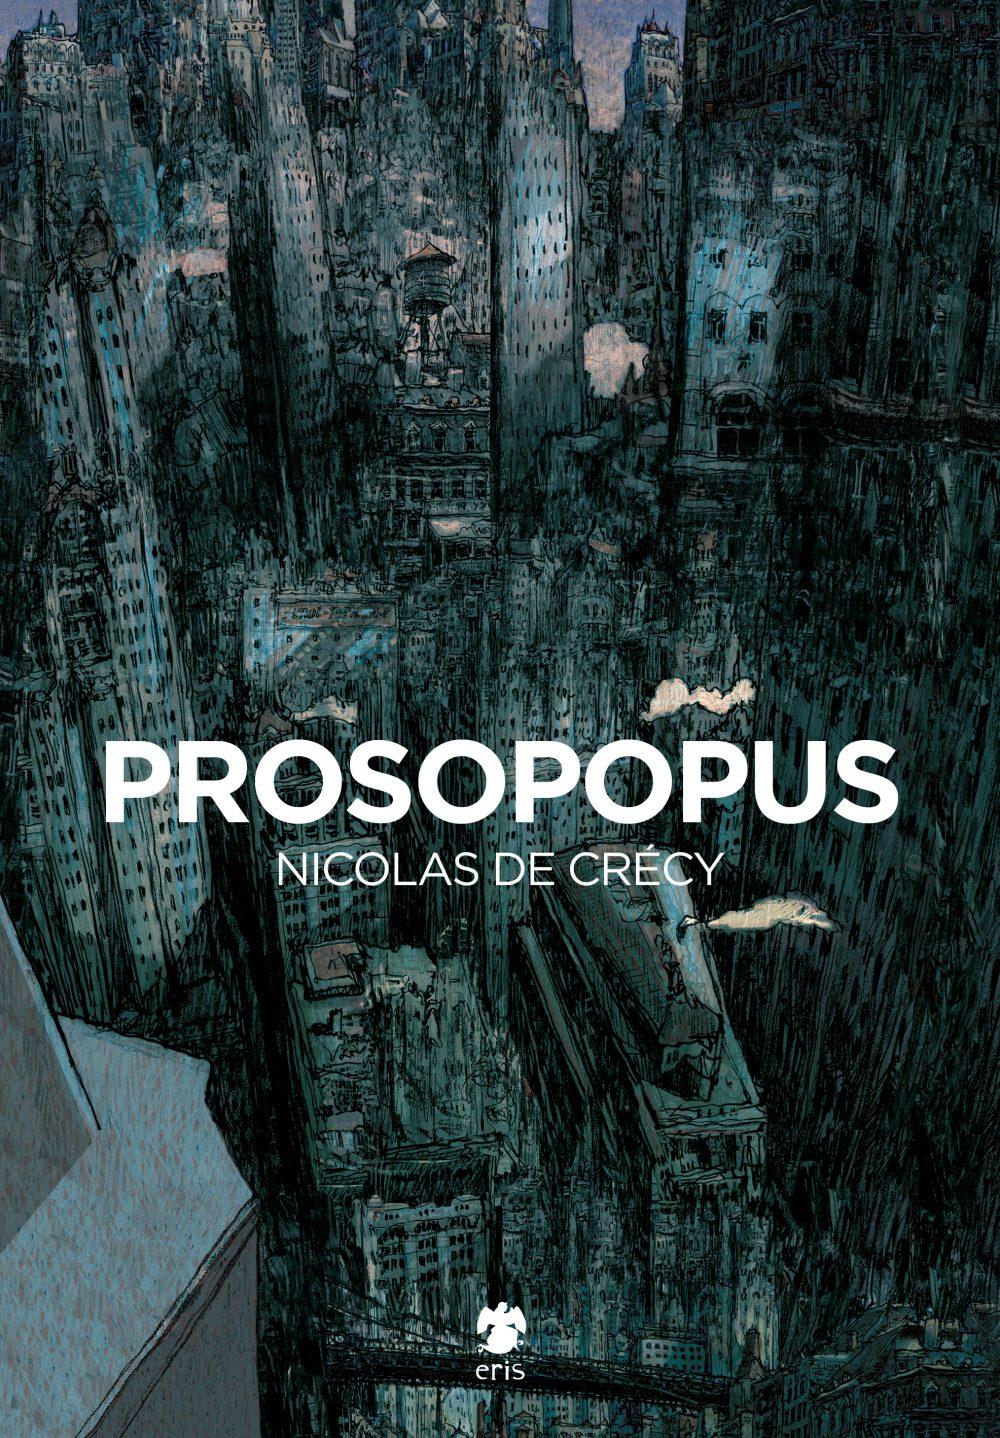 Prosopopus, copertina di Nicolas de Crécy